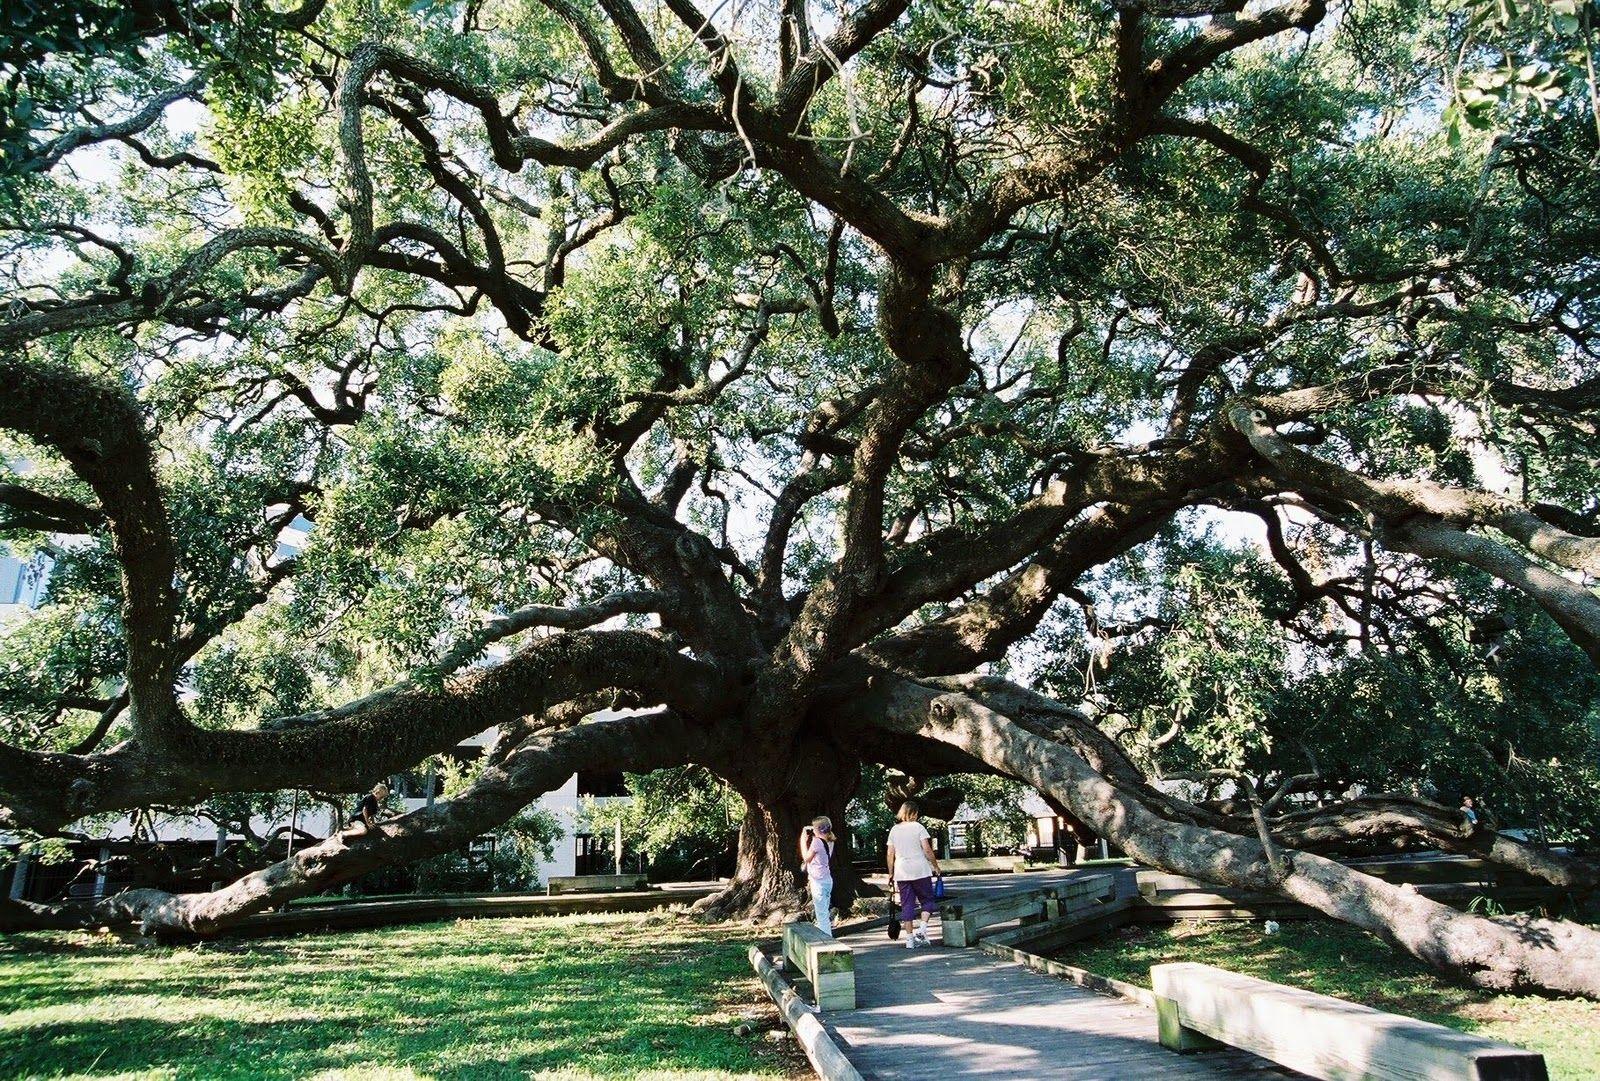 Urban Forestry Success, Treaty Oak, Quercus virginiana